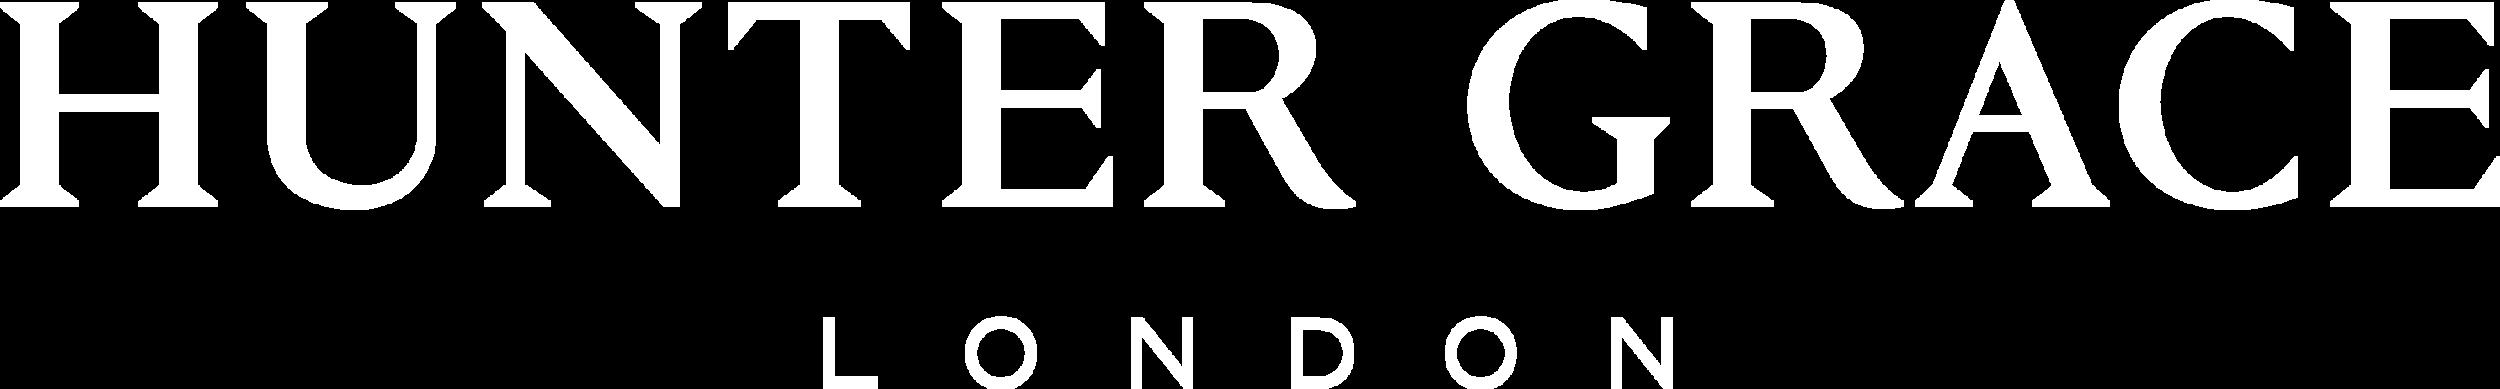 Hunter Grace Logo White@4x-8.png